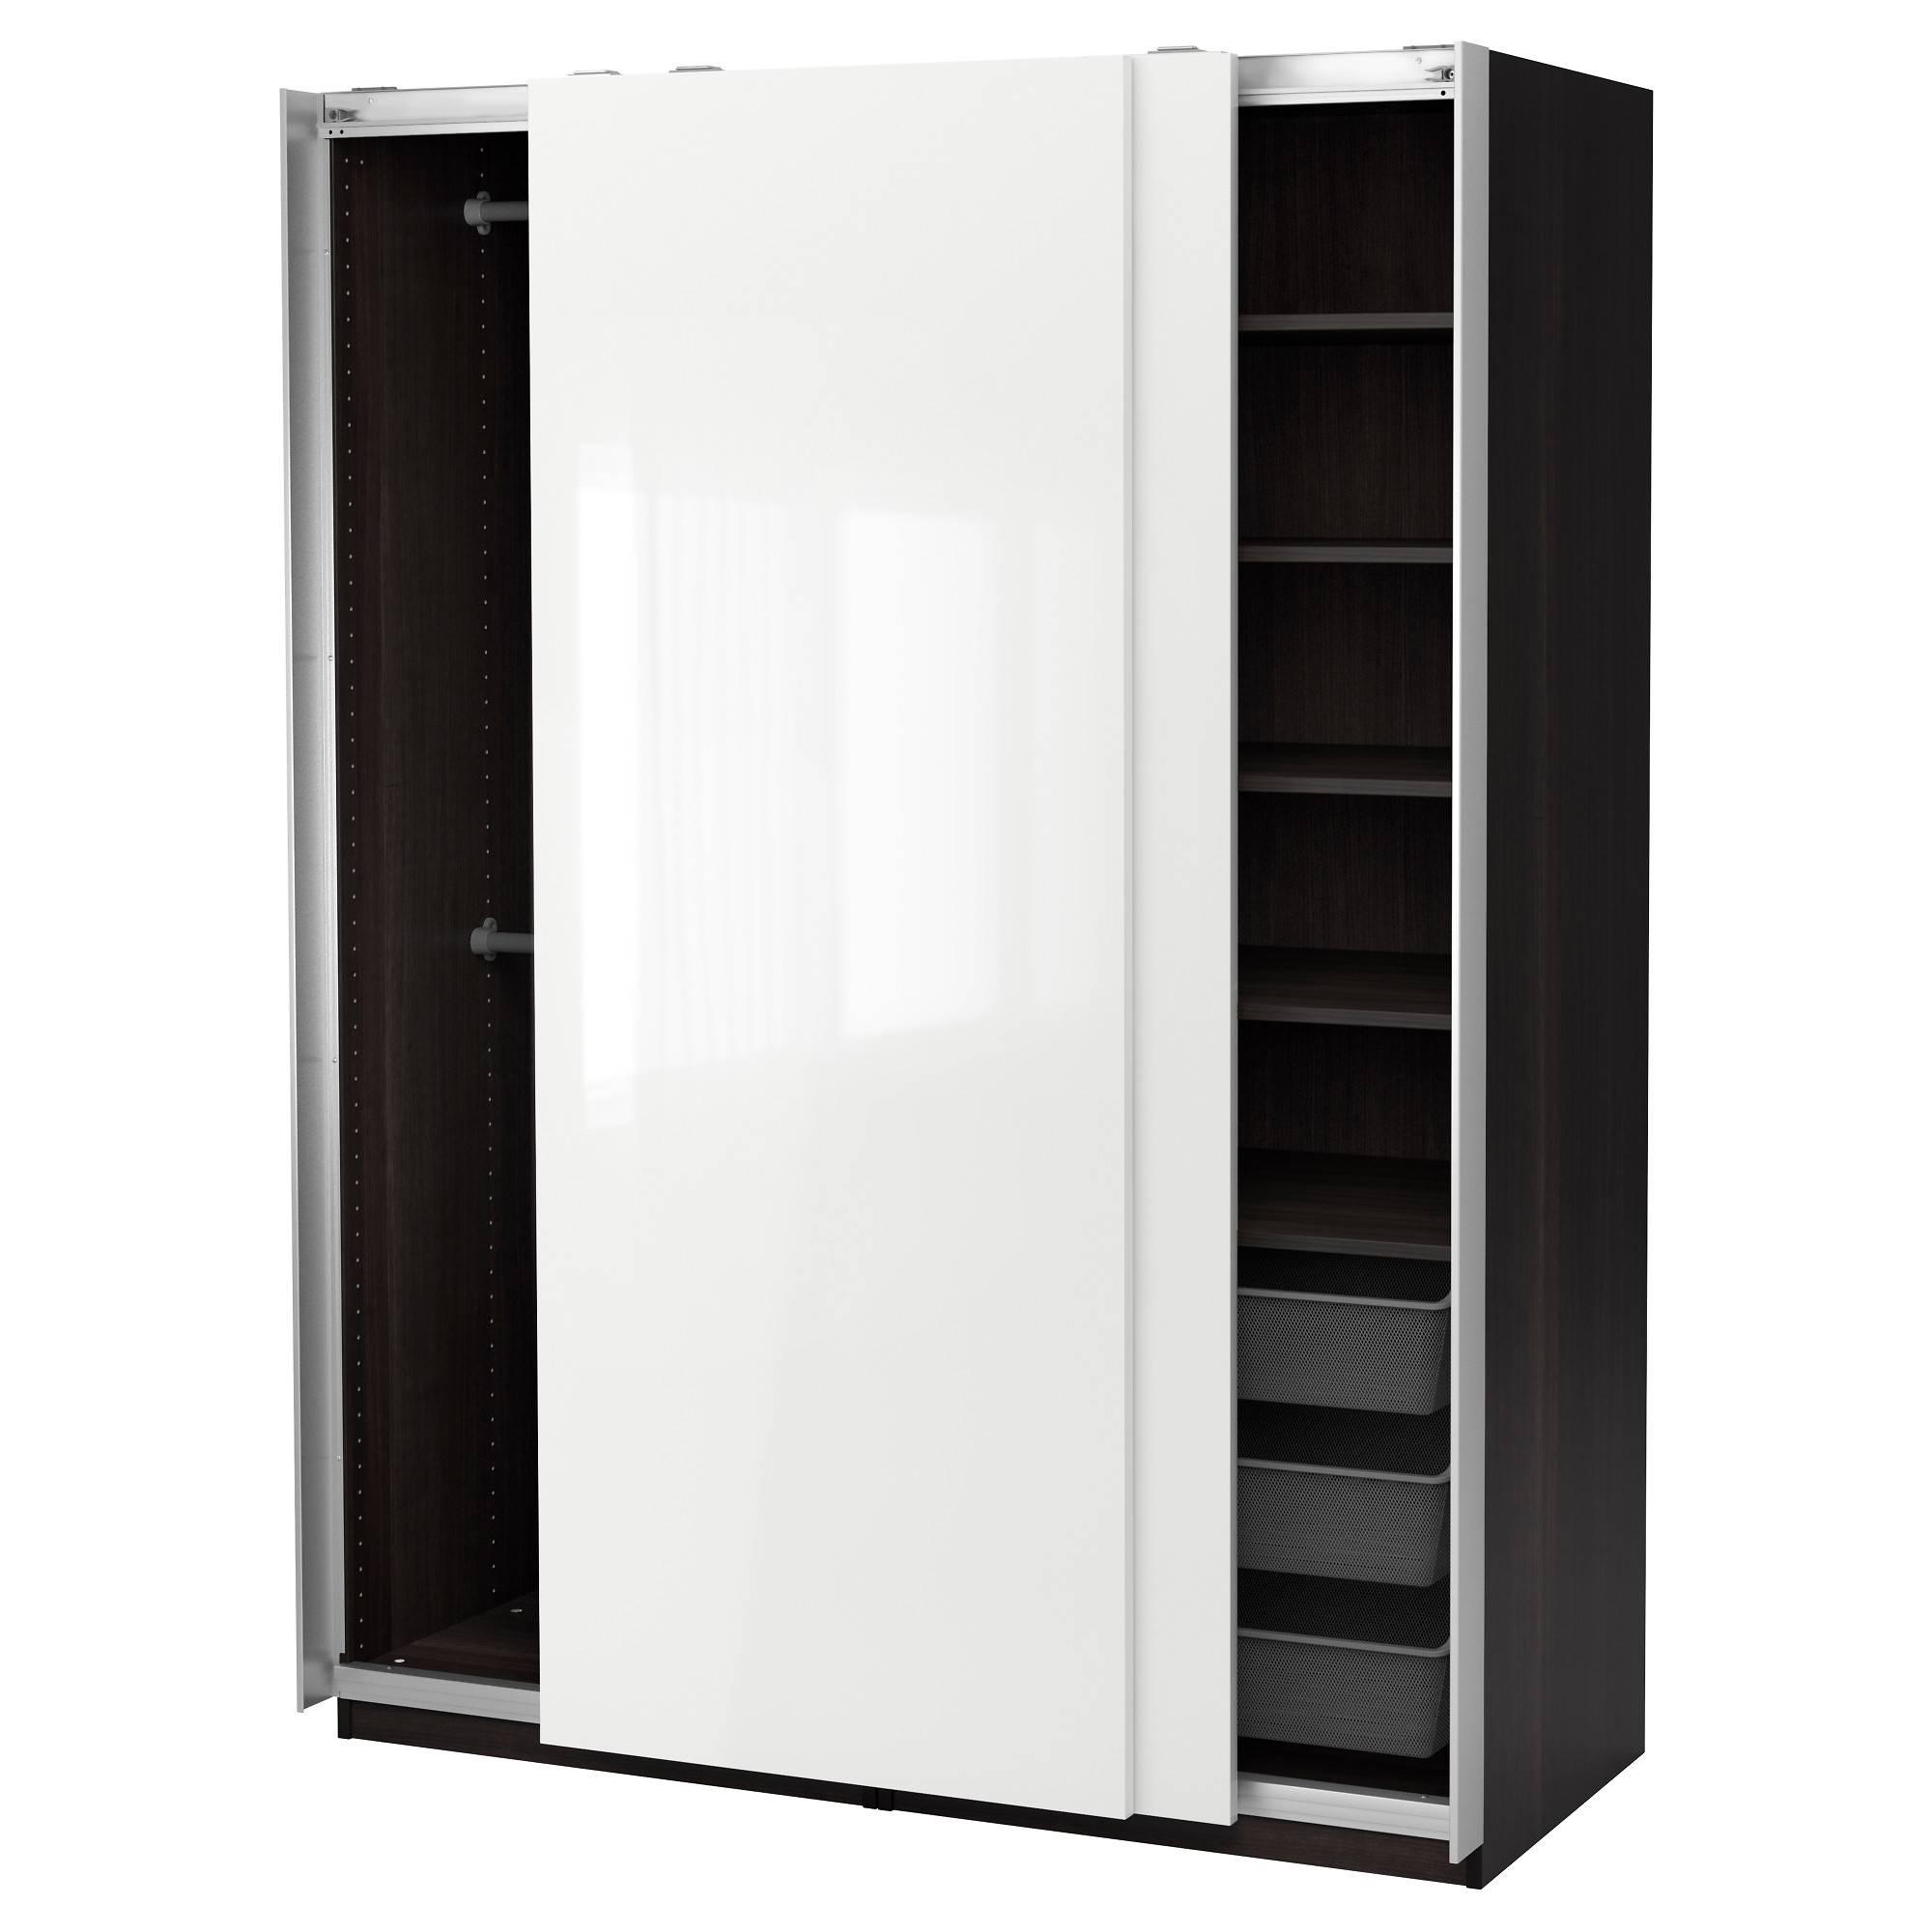 Pax Wardrobe Black-Brown/hasvik High-Gloss/white 150X66X201 Cm - Ikea throughout Gloss Wardrobes (Image 7 of 15)